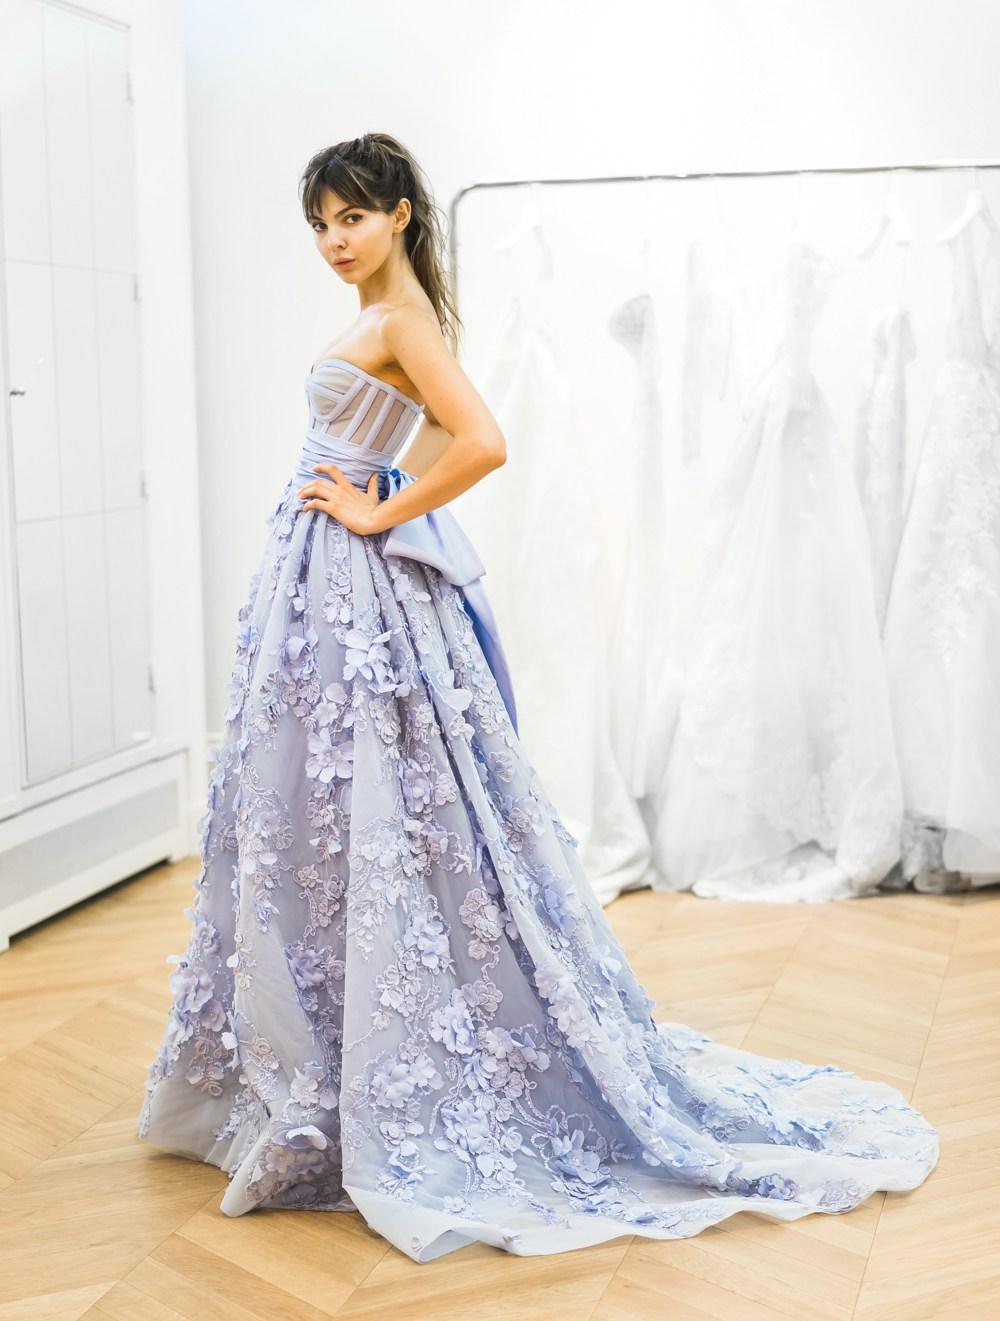 doina-ciobanu-zuhair-murad-haute-couture-fashion-blogger-paris-8